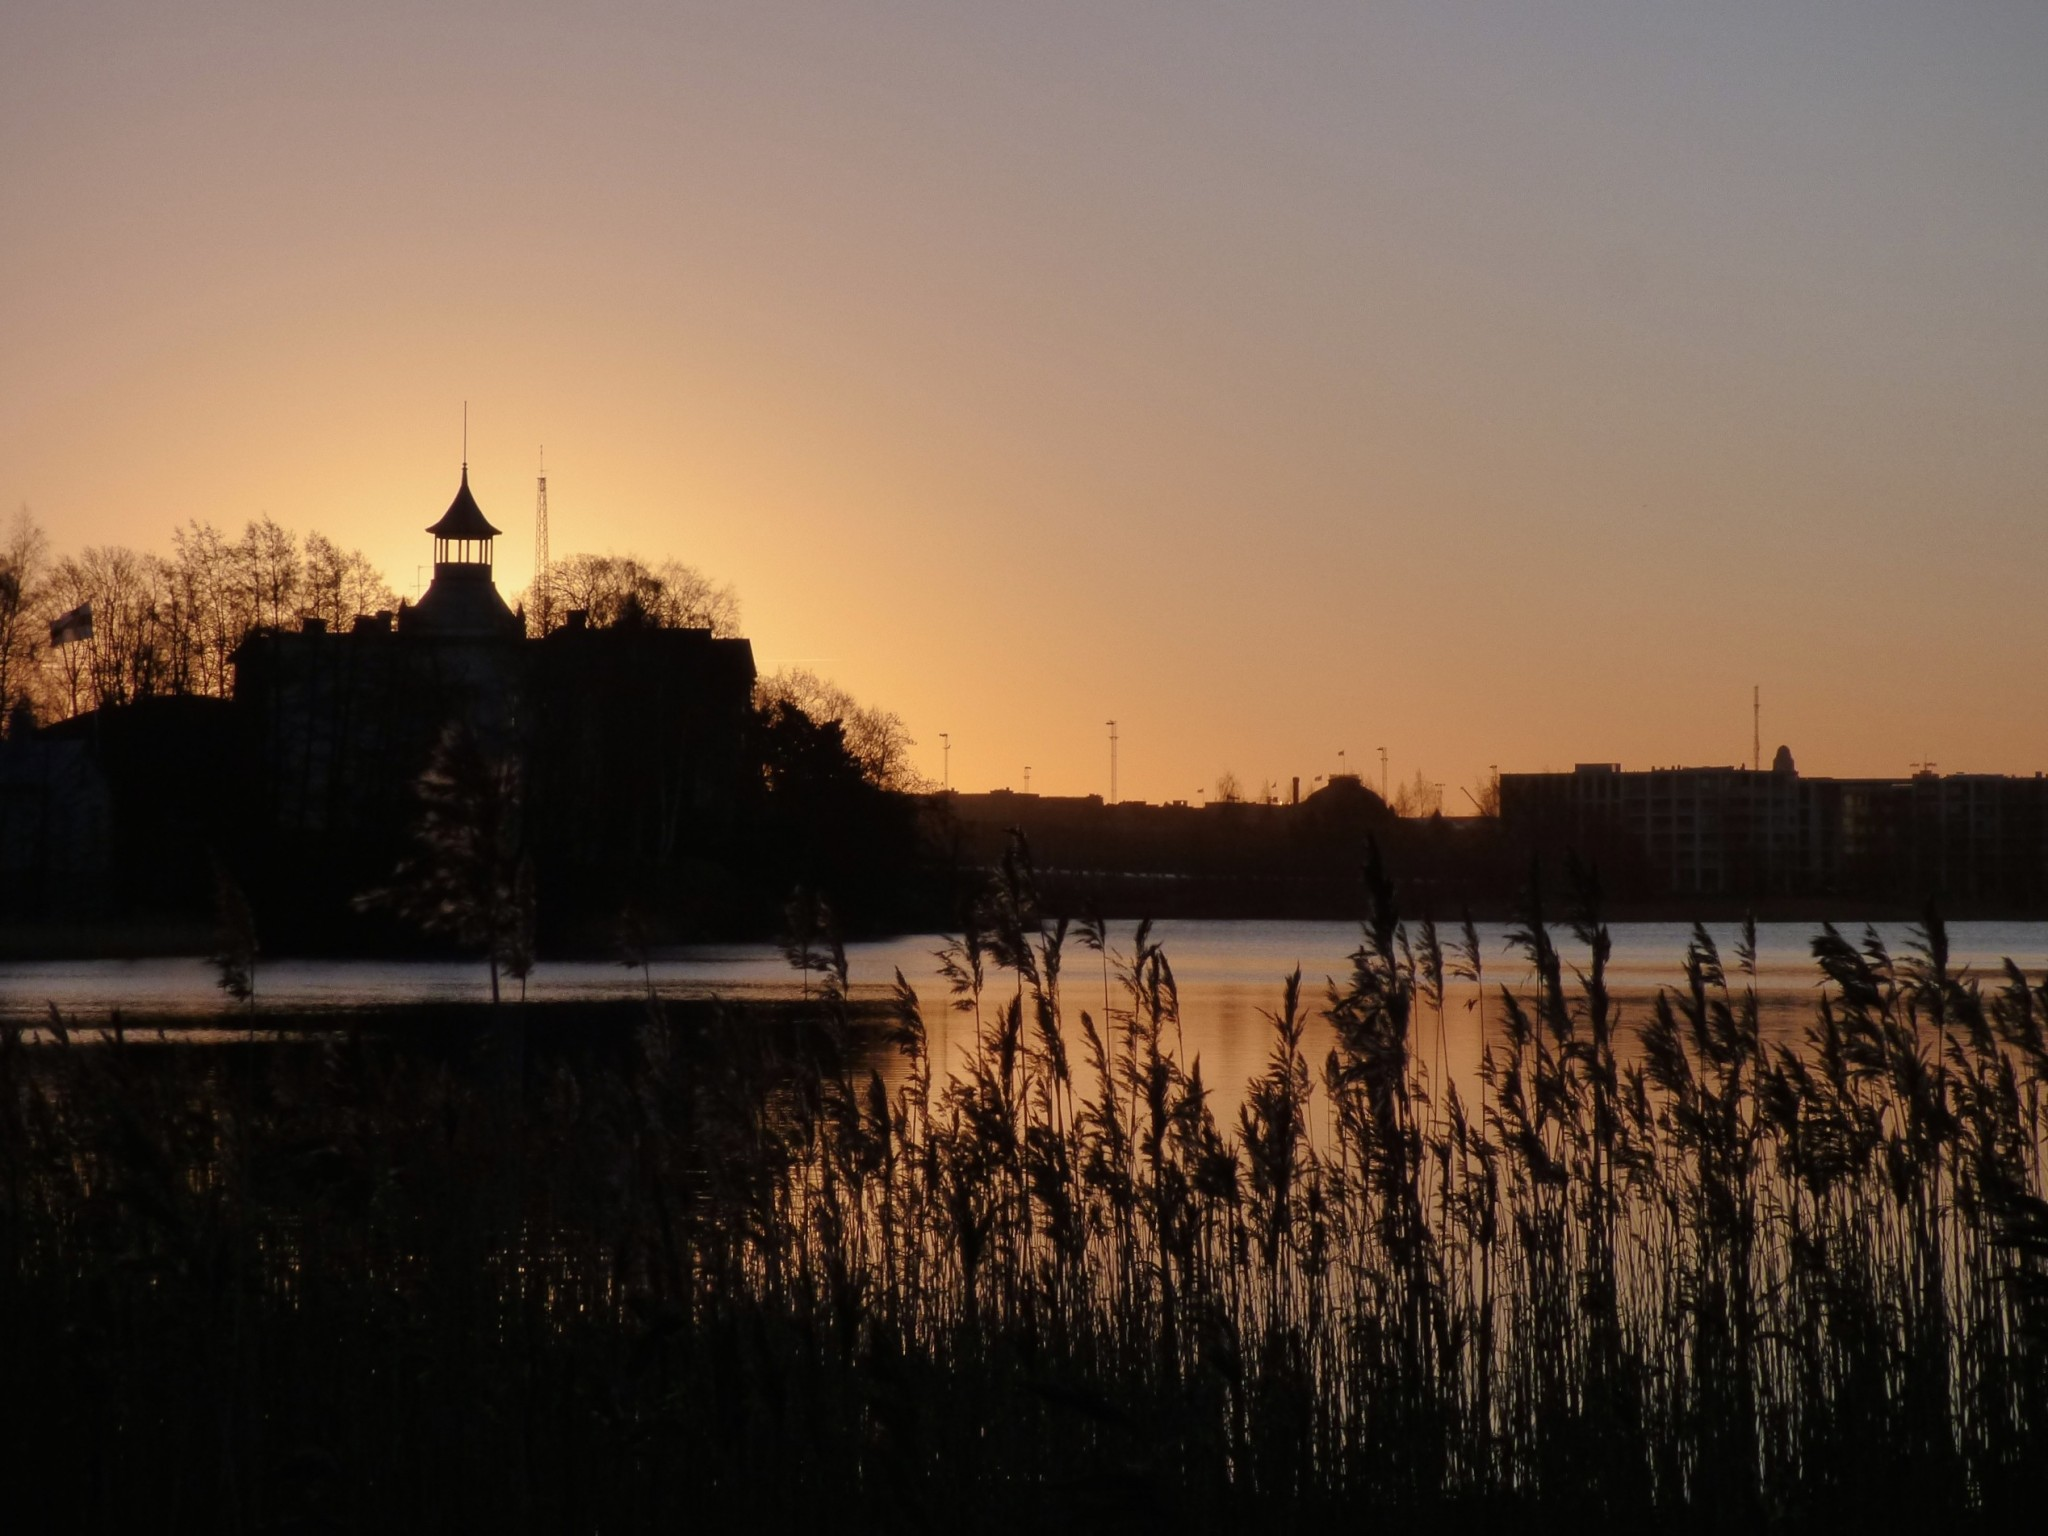 Töölönlahti auringonnousu